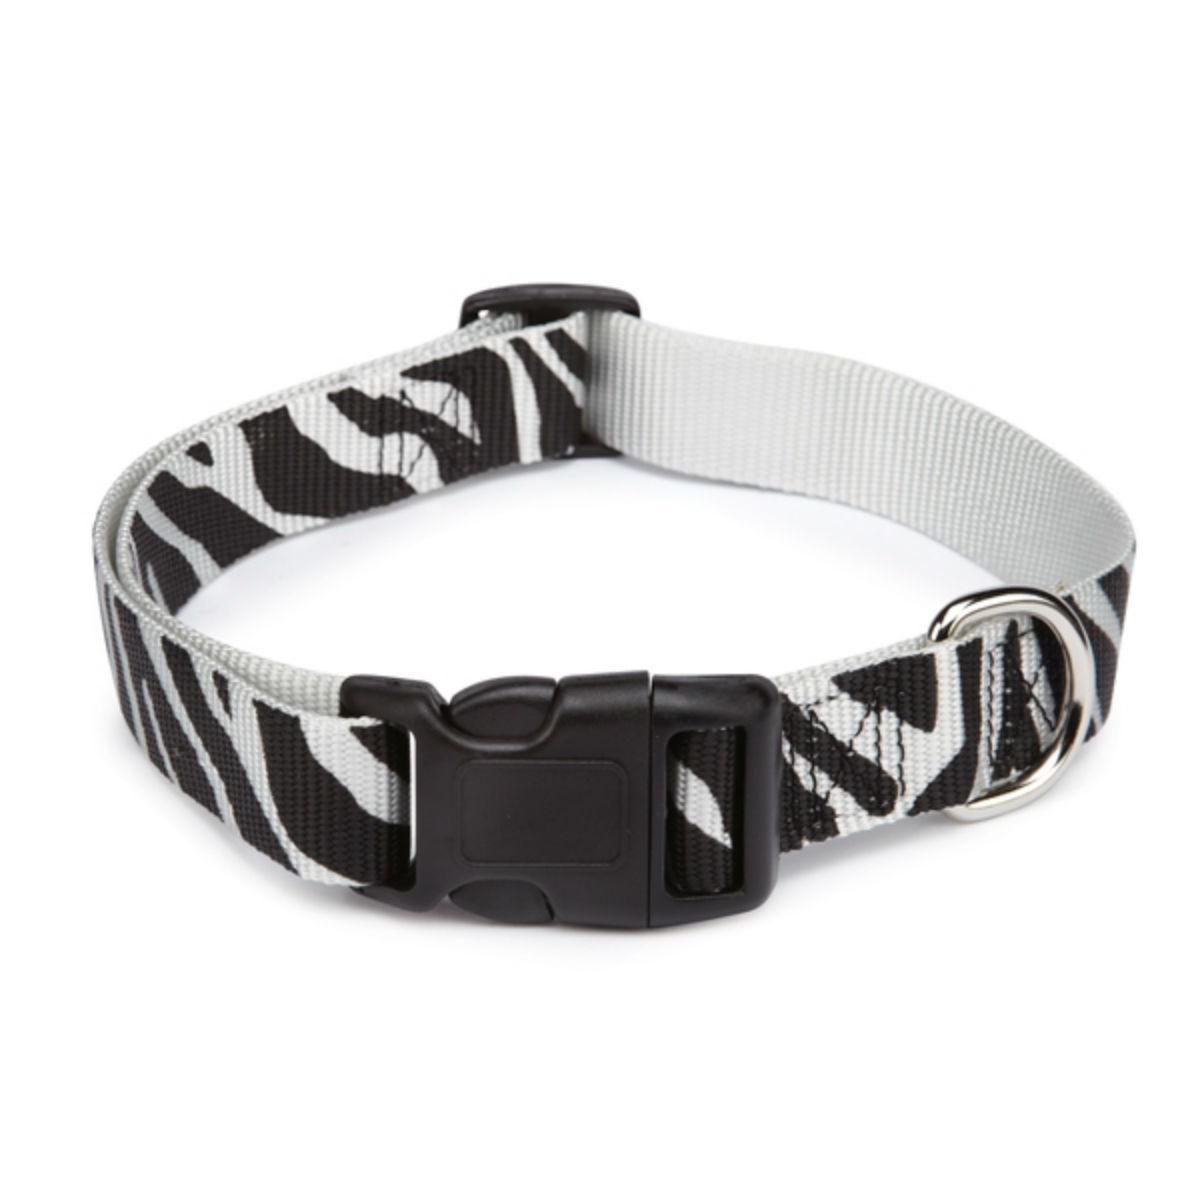 Casual Canine Animal Print Dog Collar - Zebra